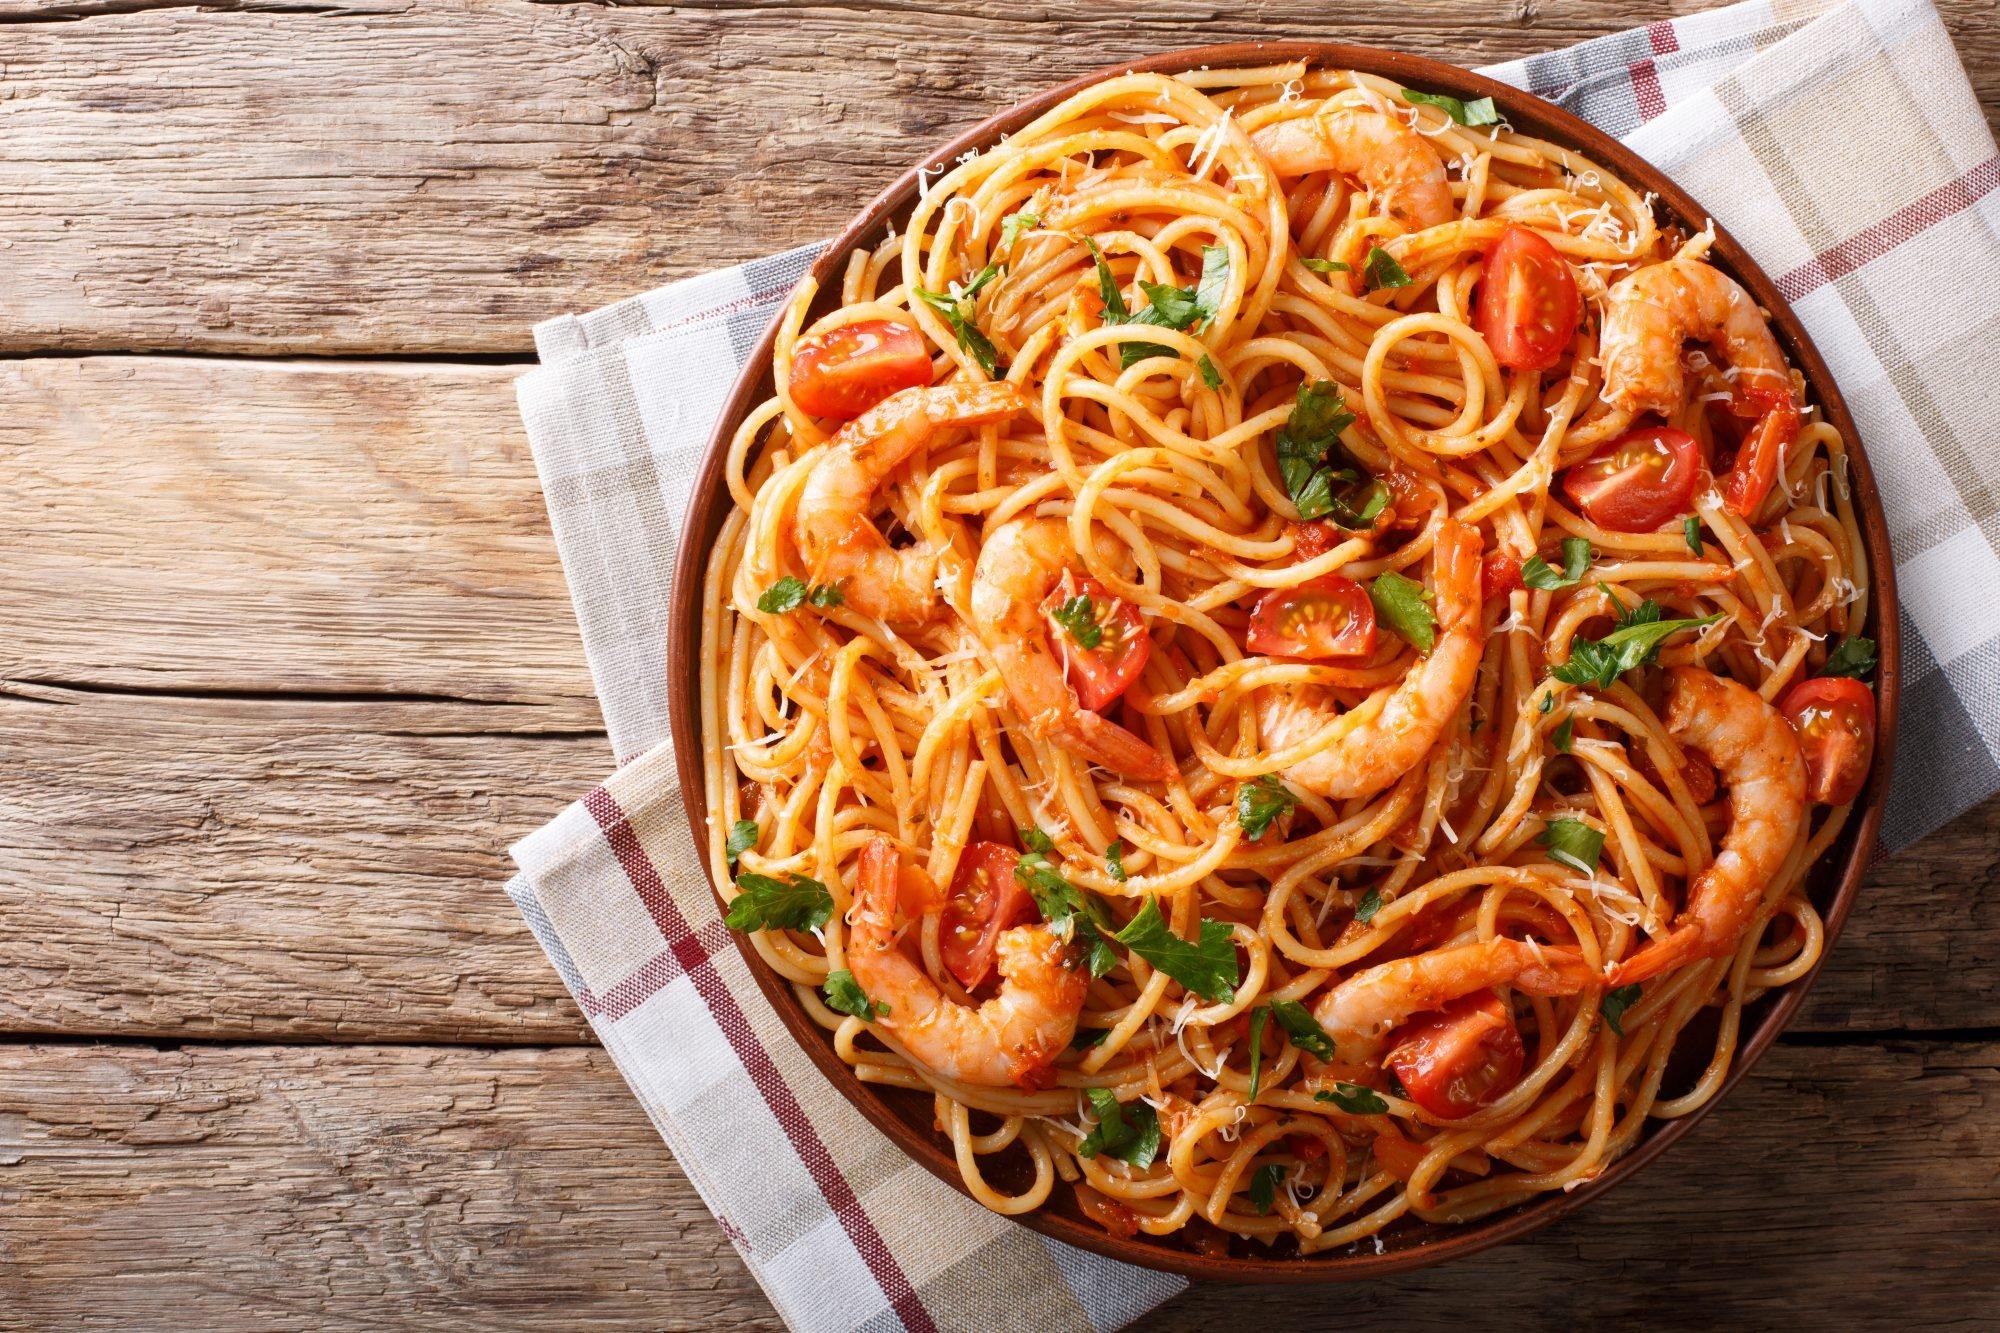 Spaghetti Shrimp Fra Diavolo Recipe with Black Truffle Arrabbiata Sauce